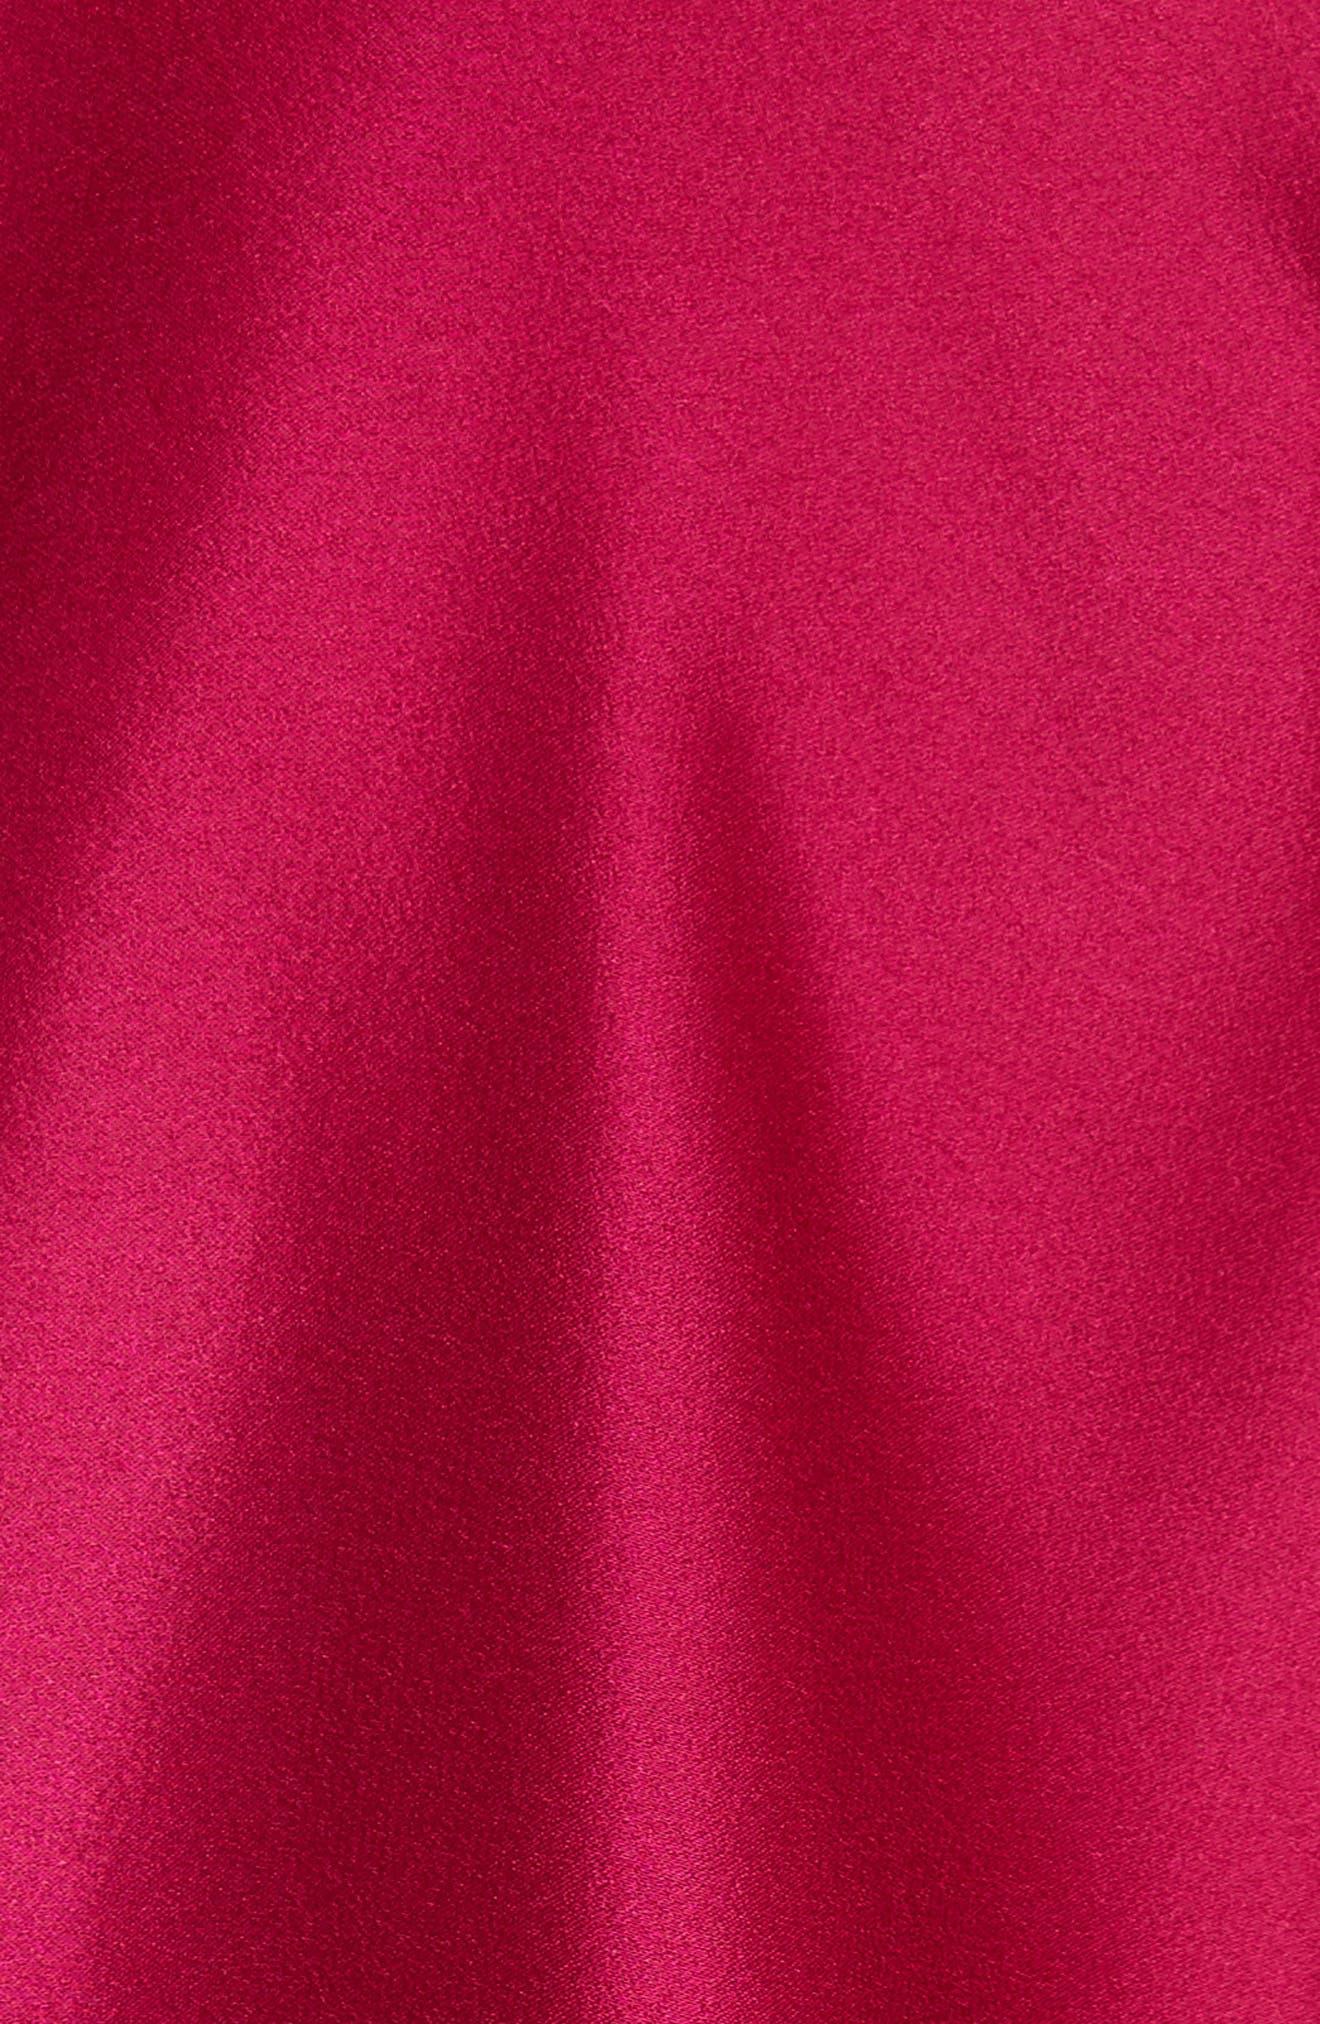 Popover Cape Liquid Crepe Column Gown,                             Alternate thumbnail 5, color,                             651